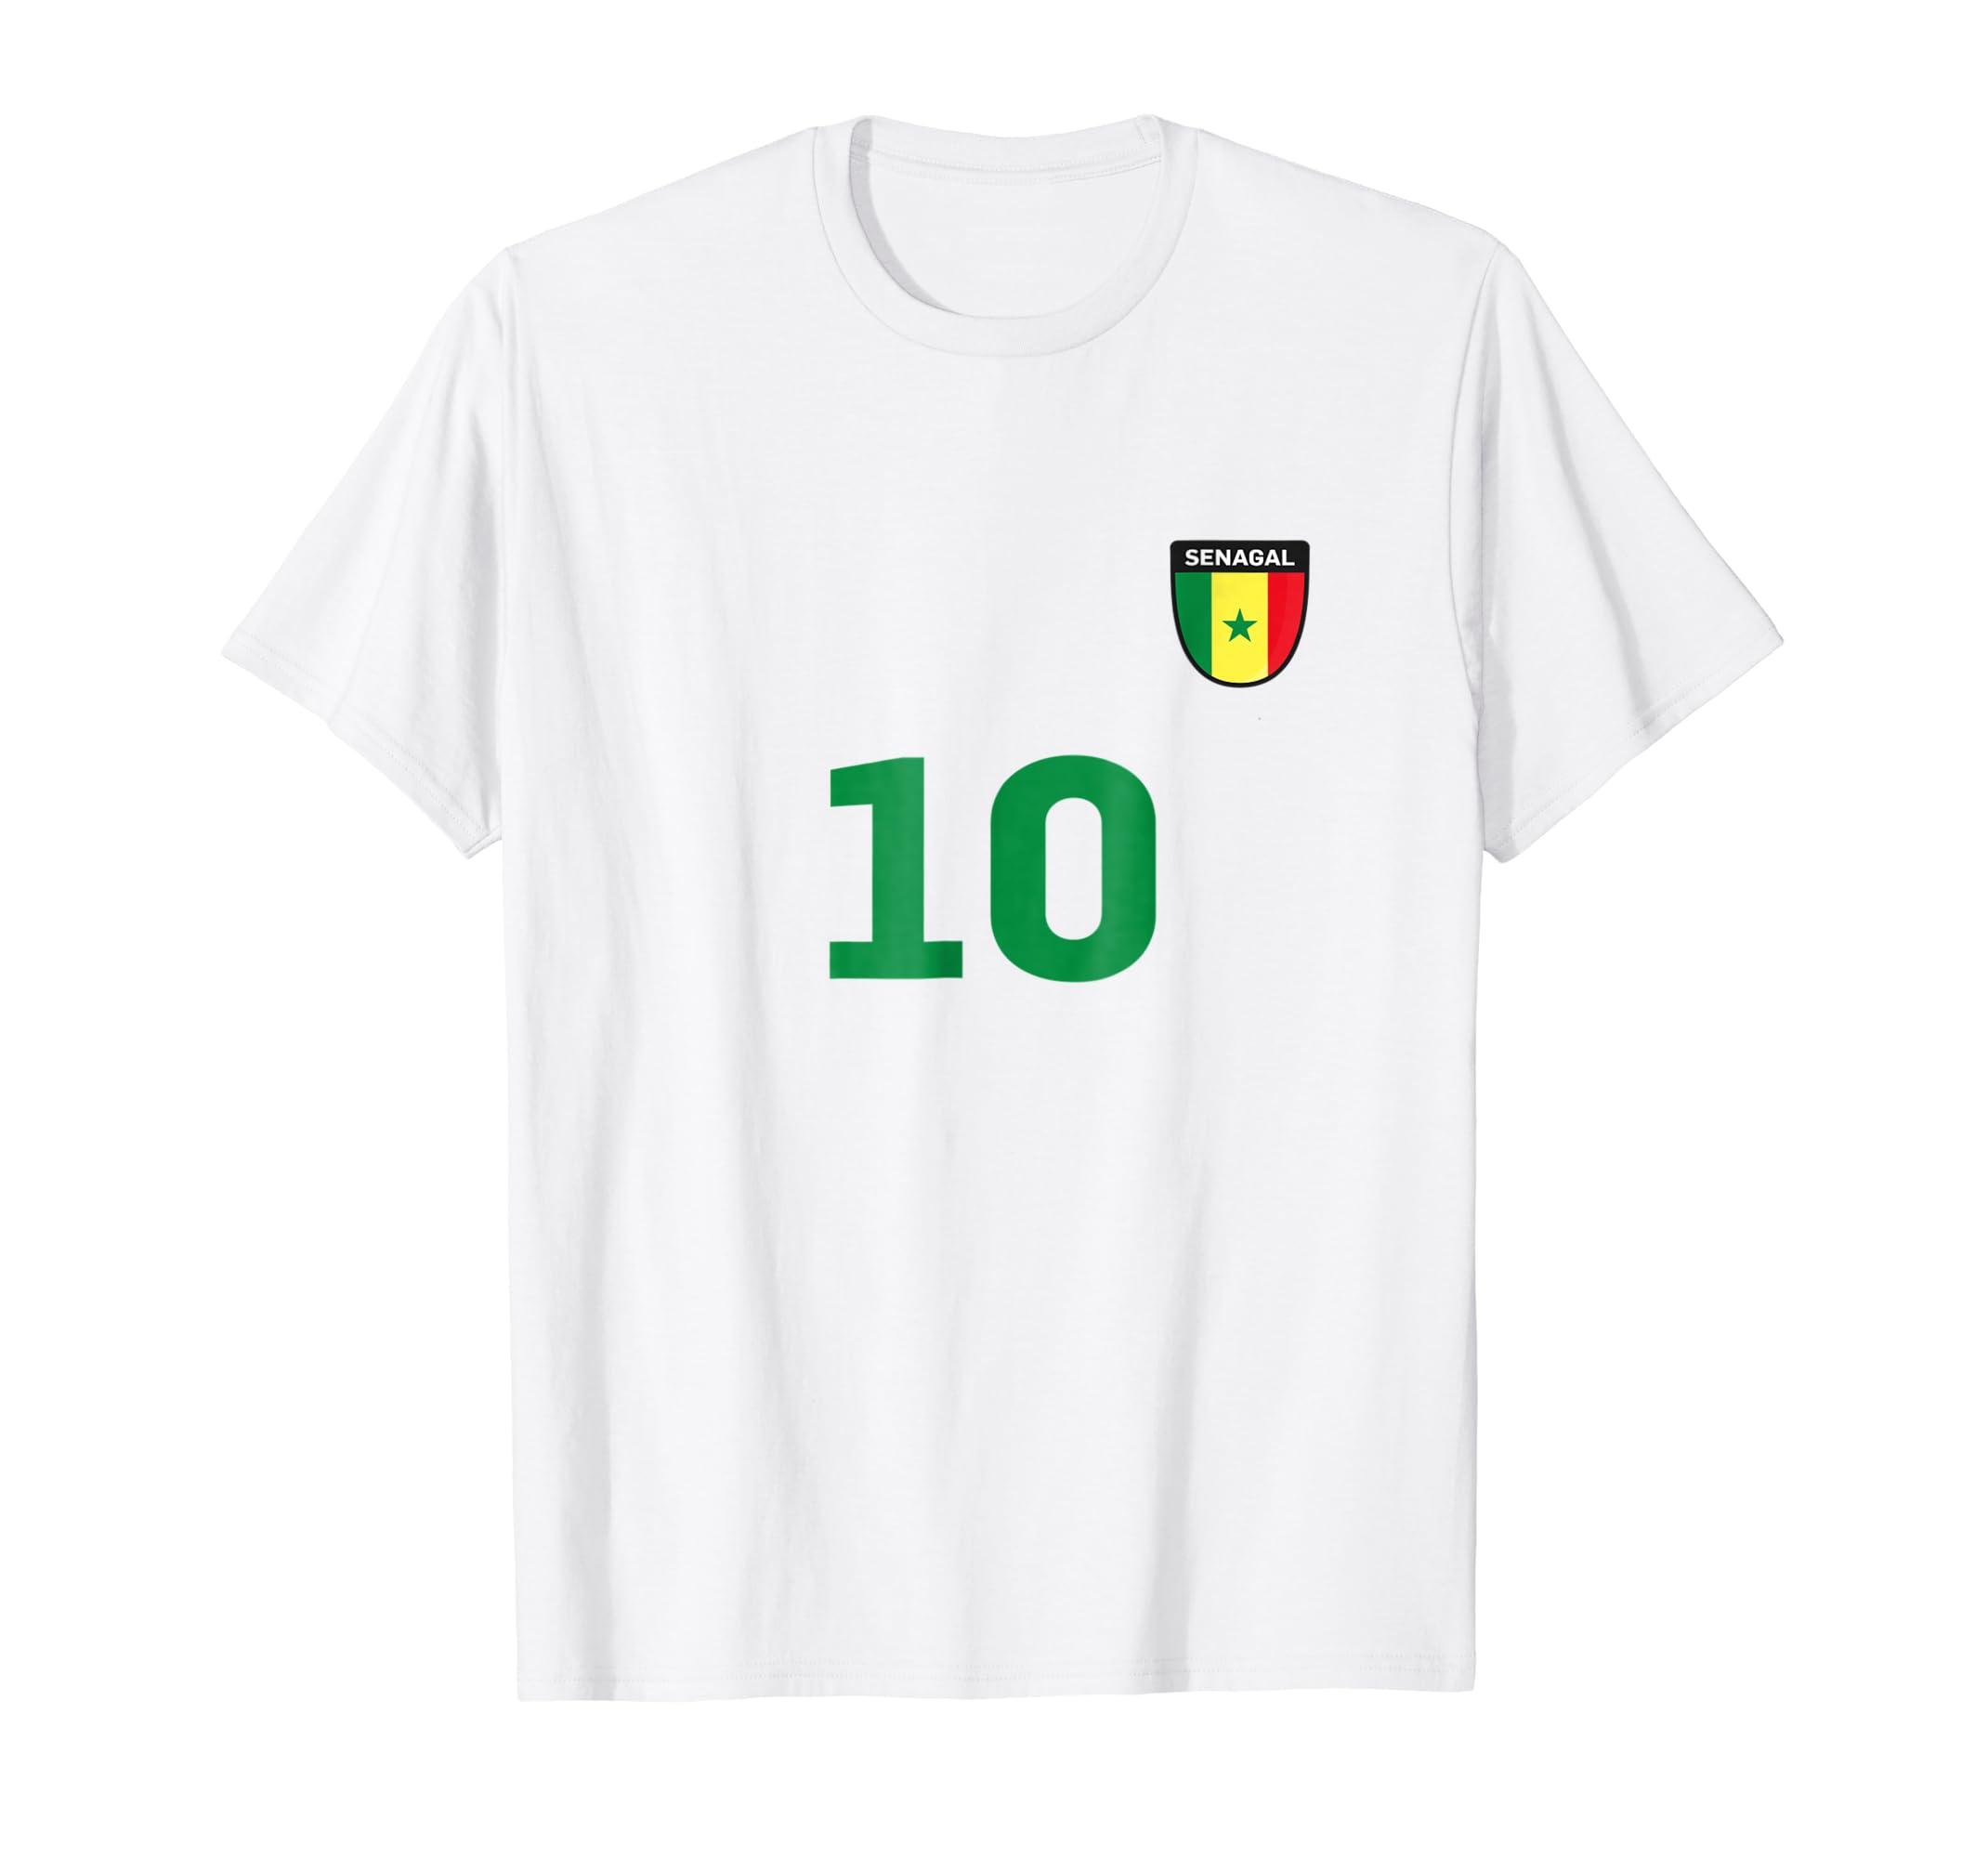 new product 9de6a f2c82 Amazon.com: Senegal Soccer Jersey World Football 2018 Fan ...